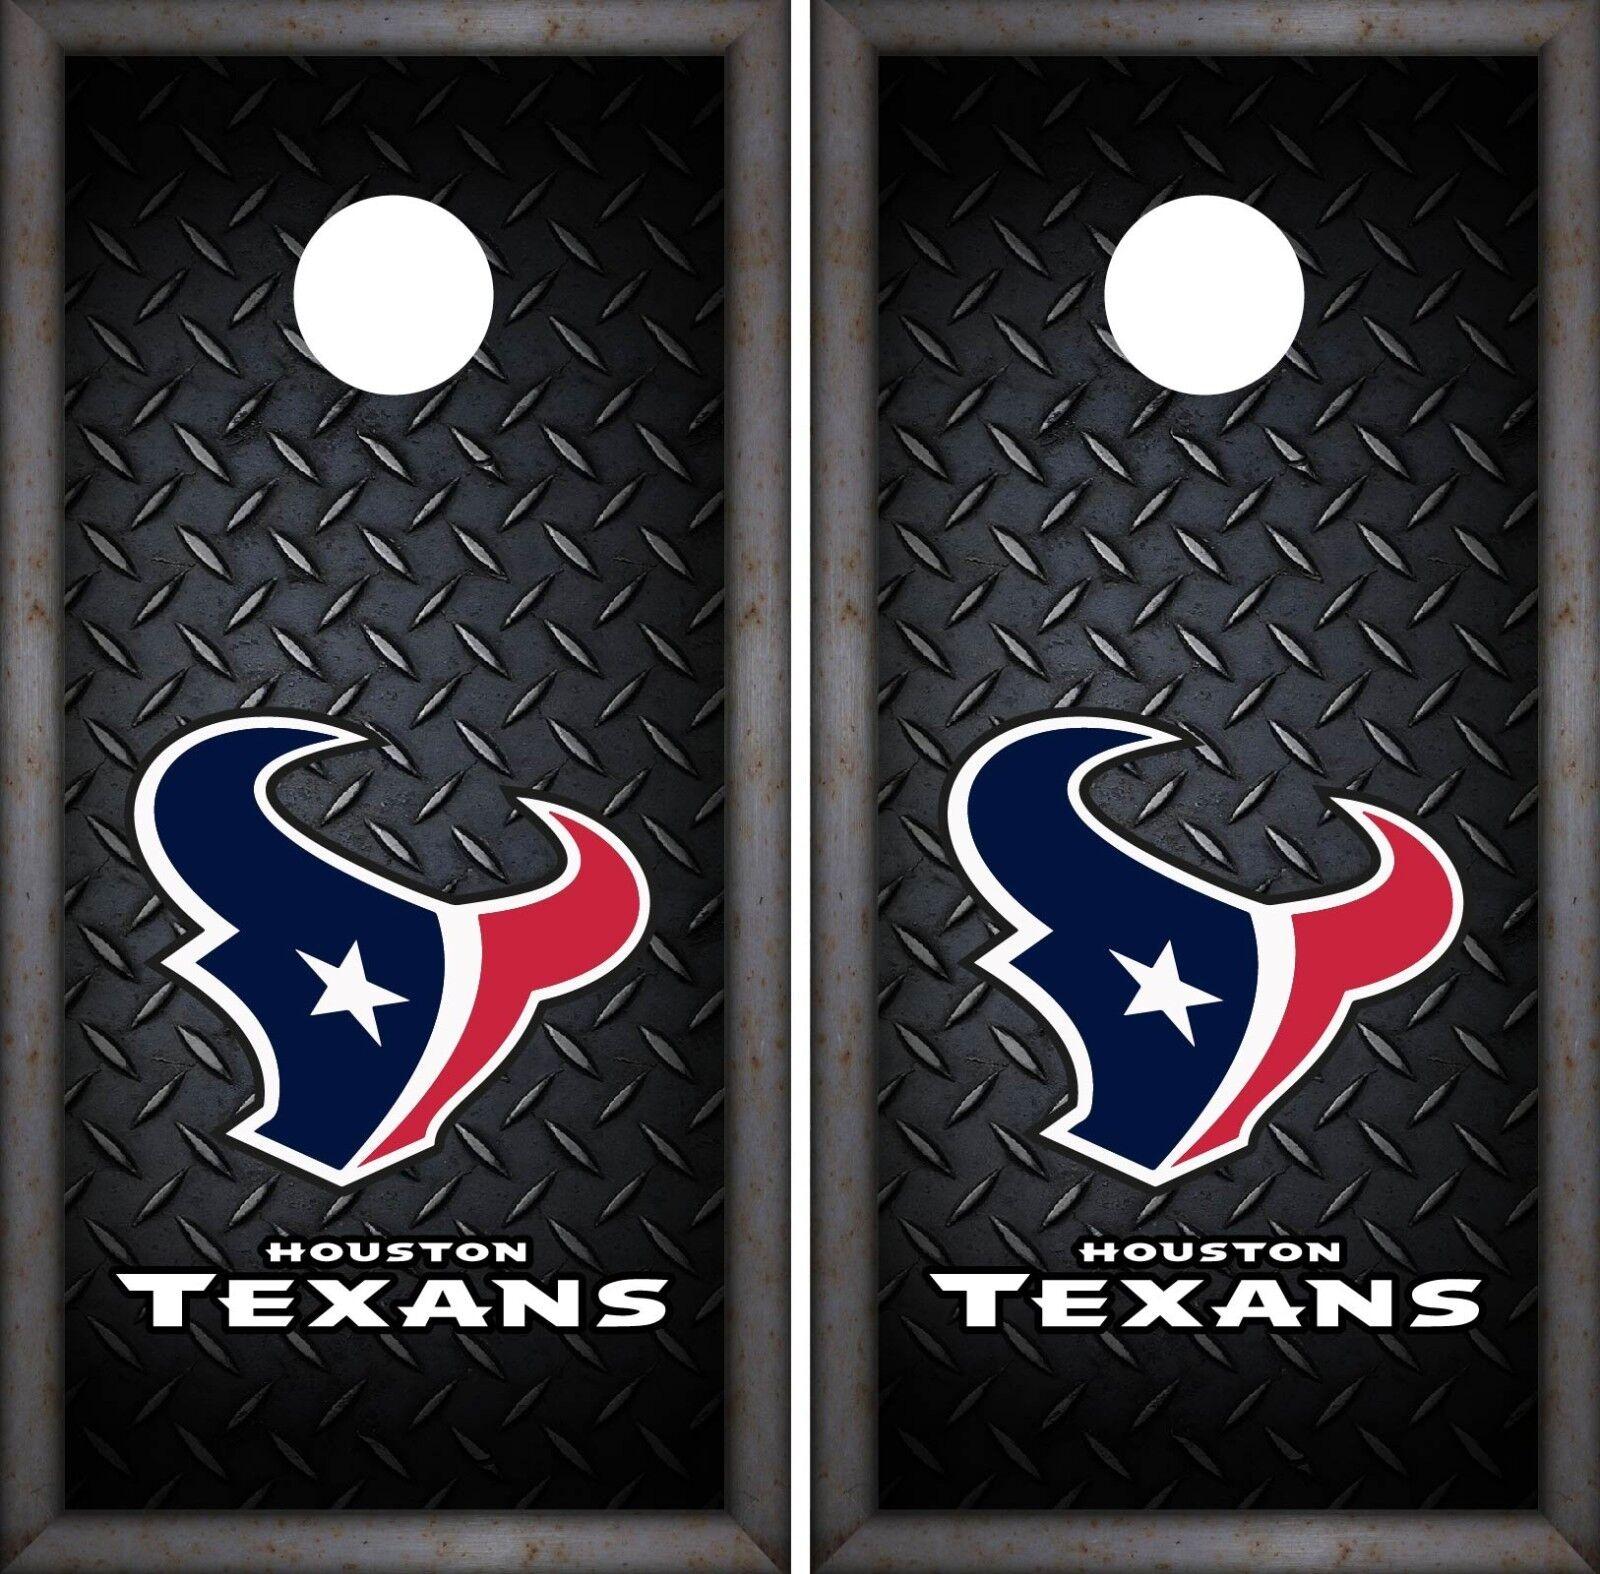 Houston  Texans Cornhole Wrap NFL Luxury Game Skin Board Set Vinyl Decal CO77  at cheap